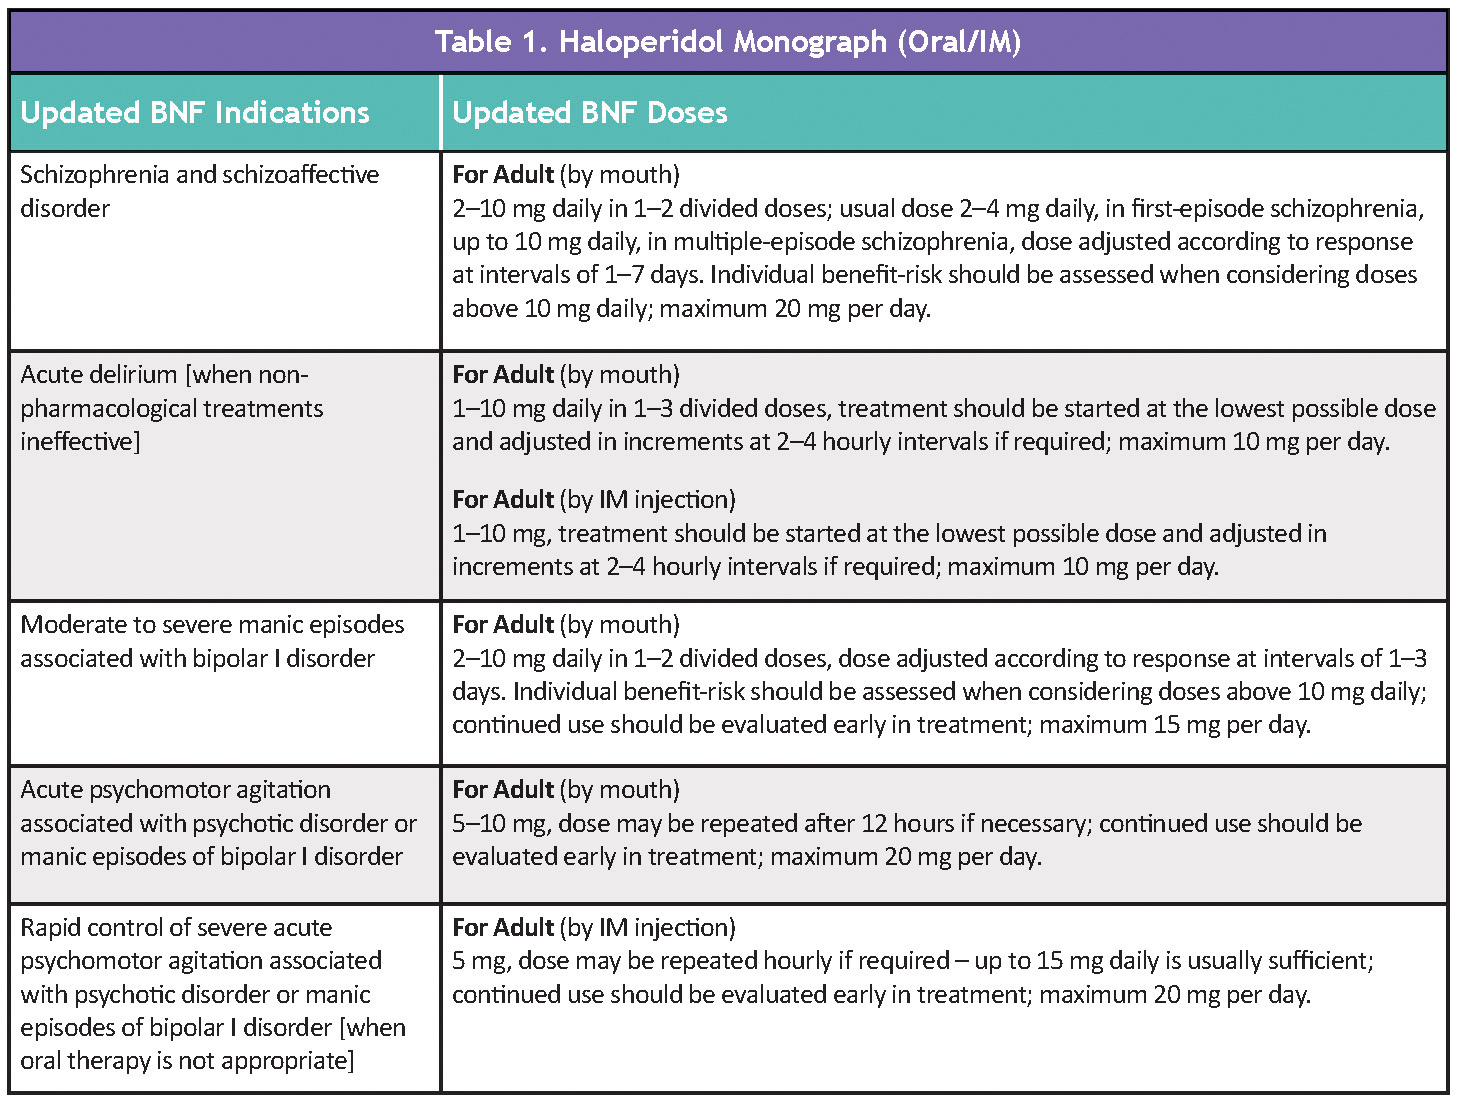 BNF dose changes to haloperidol and haloperidol decanoate (depot) – Ashtons  Hospital Pharmacy